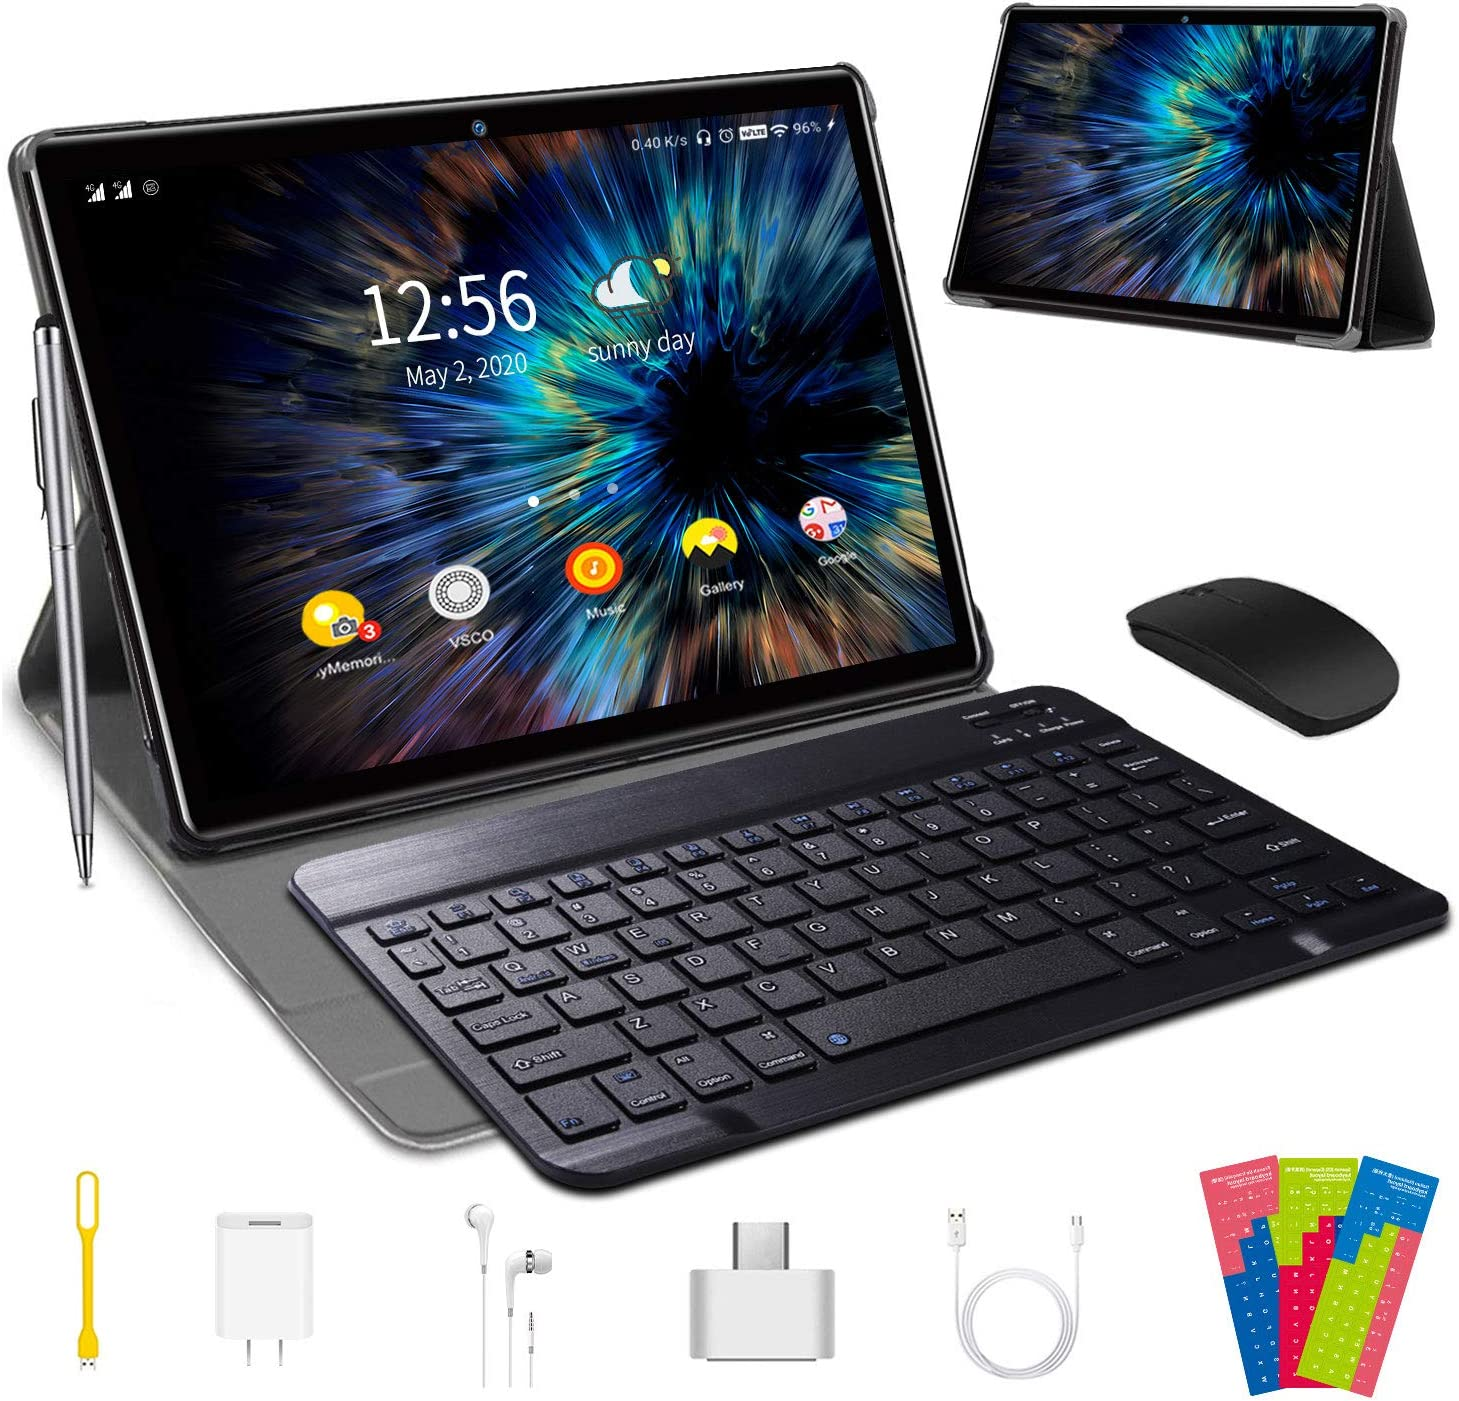 Tablet 10 Pulgadas 4 GB RAM 64GB/128GB ROM Android 9.0 Certificación Google GMS Ultrar-Rápido Tablets 4G LTE Dual SIM / WiFi 8000mAh Quad Core /GPS,Type-c, OTG, Netfilix/ - con Teclado (Negro)